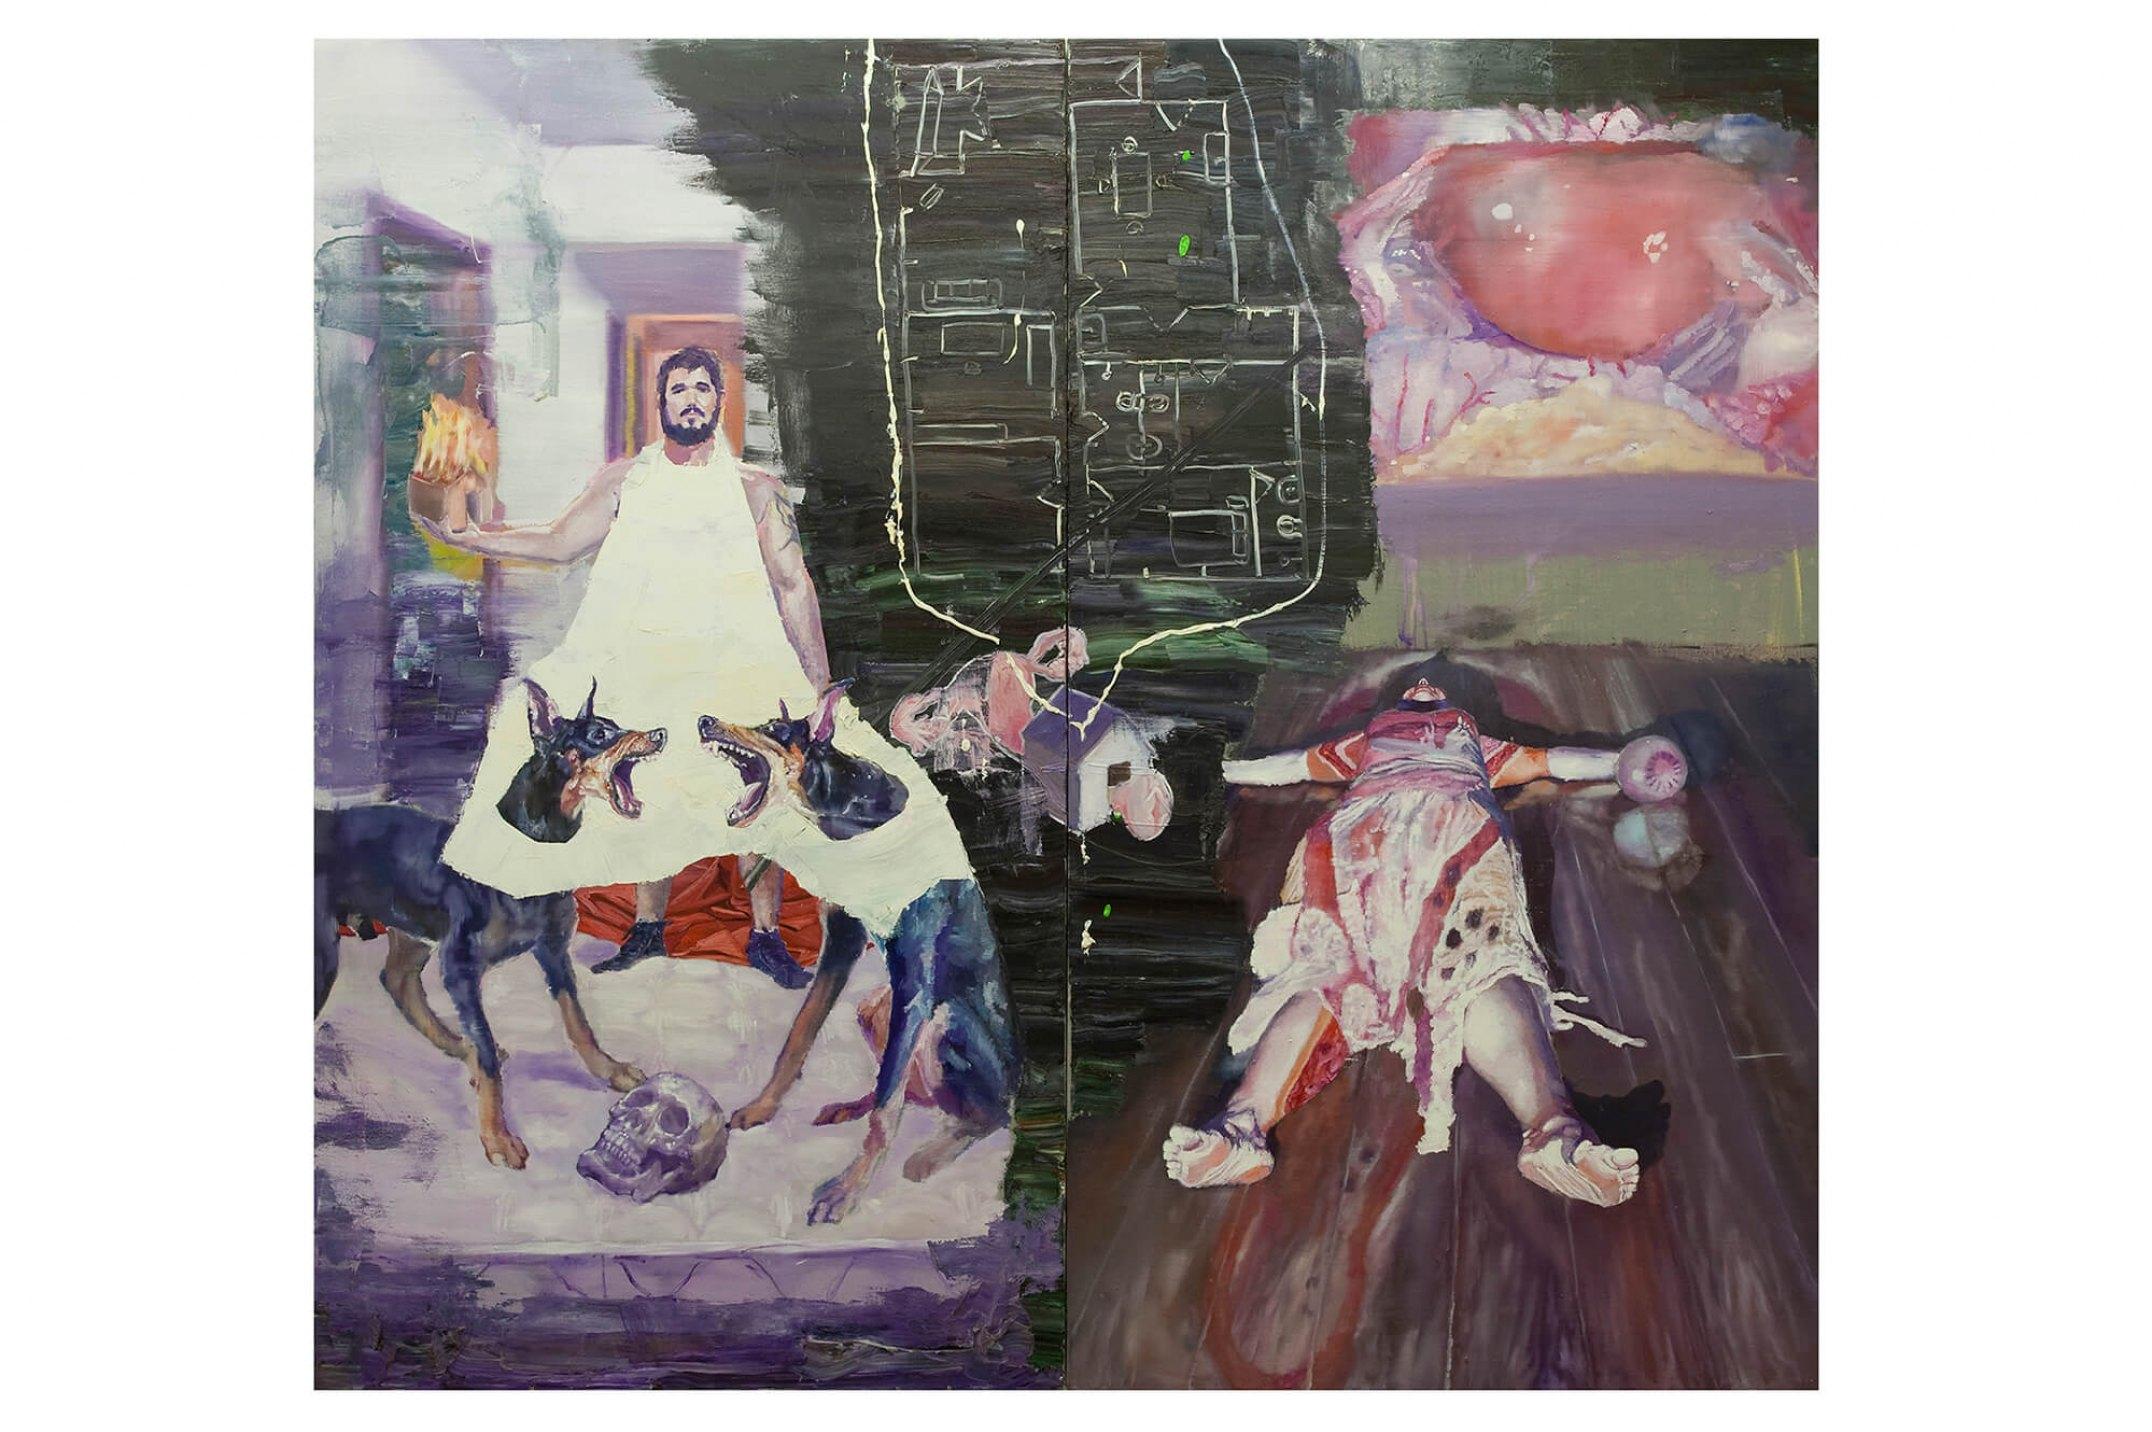 Thiago Martins de Melo,&nbsp;<em>Casa Útero</em>, 2011, oil on canvas, 180 × 200 cm&nbsp; - Mendes Wood DM